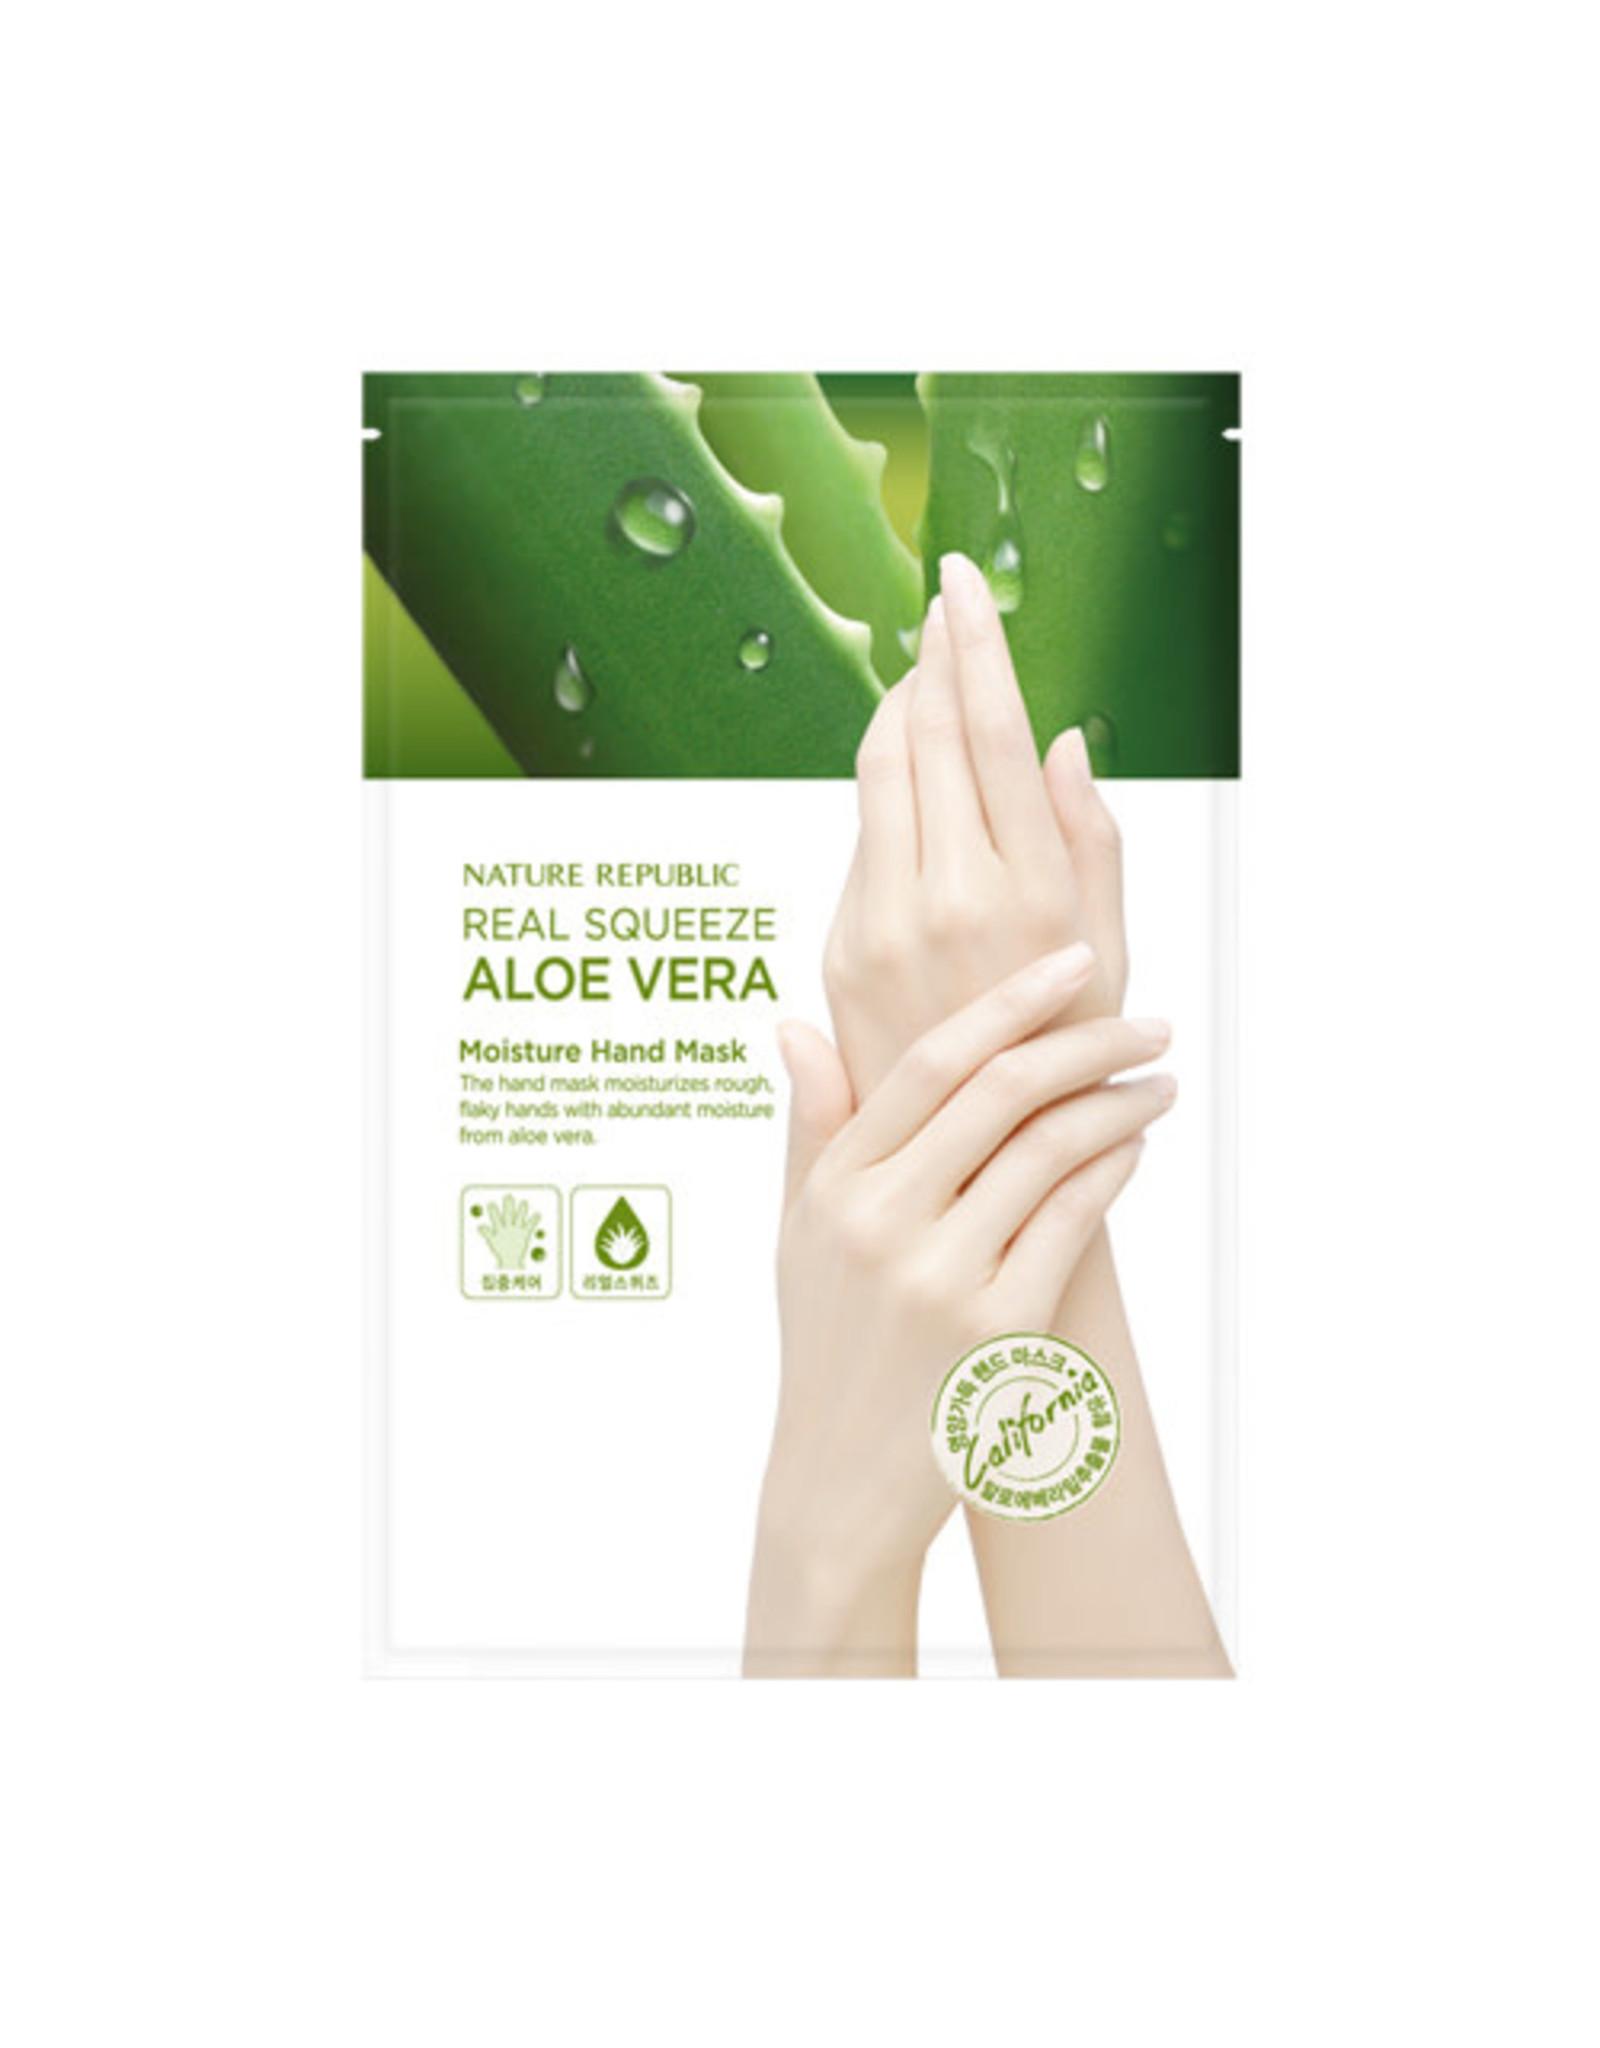 Real Squeeze Aloe Vera Moisture Hand Mask